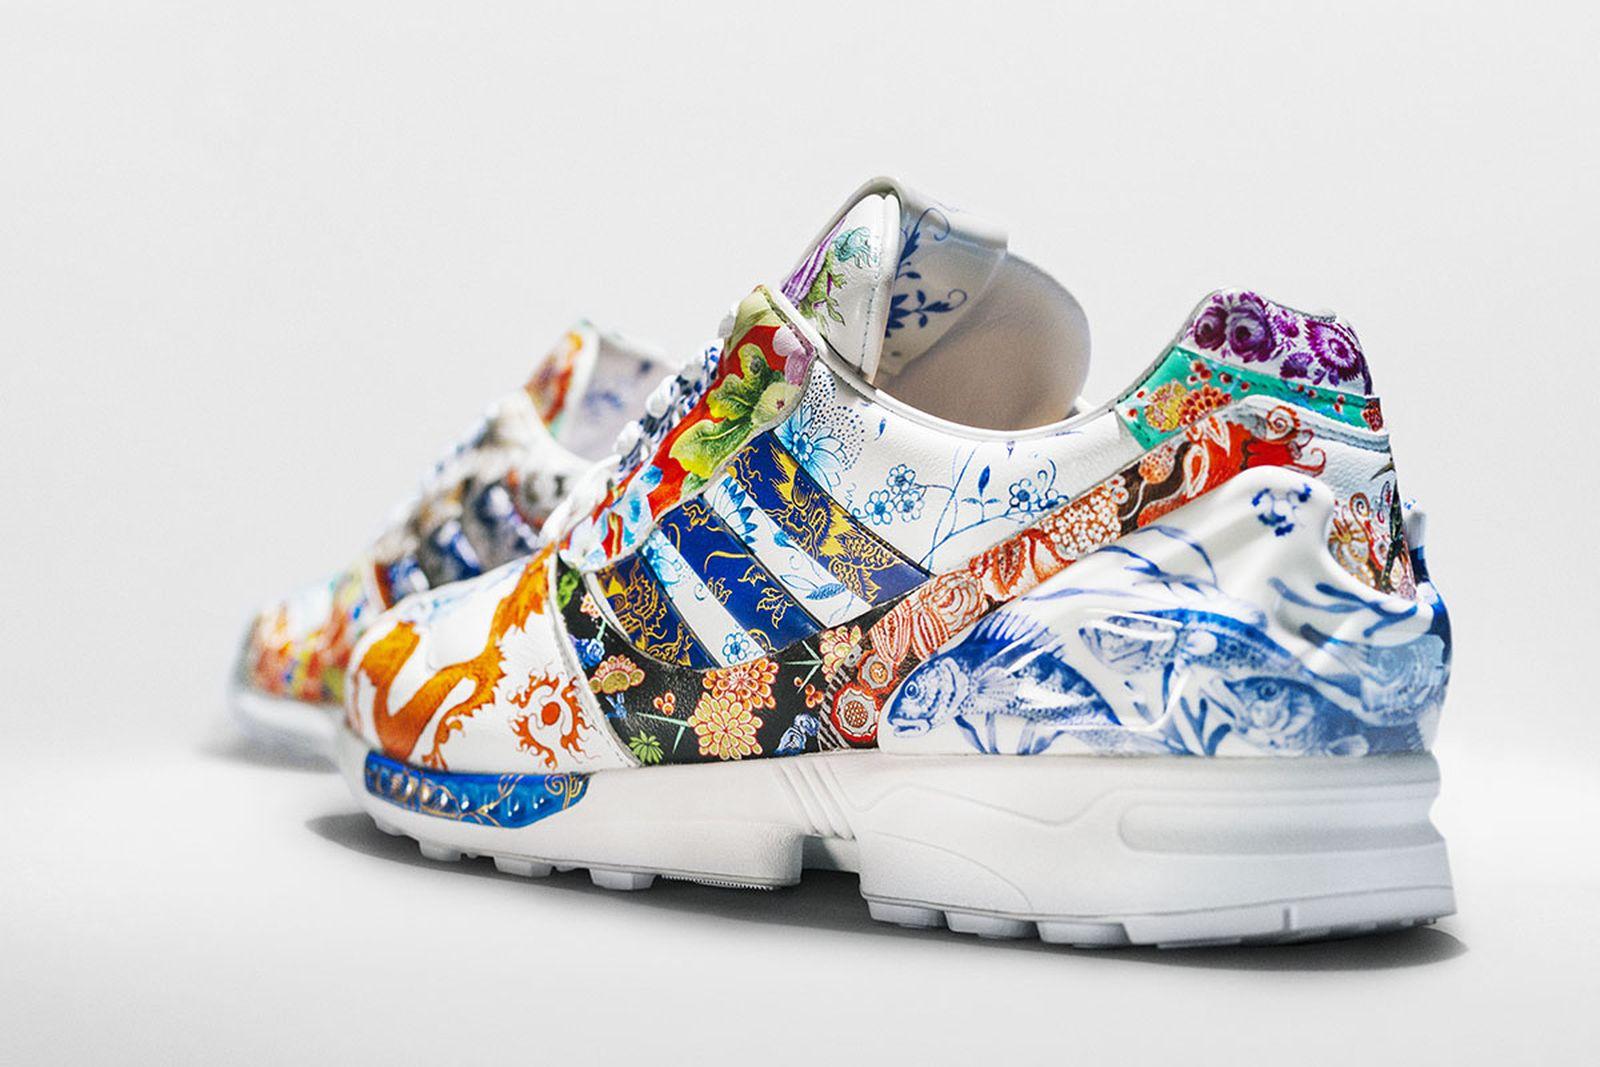 meissen-adidas-zx8000-porcelain-auctioning-sothebys-01